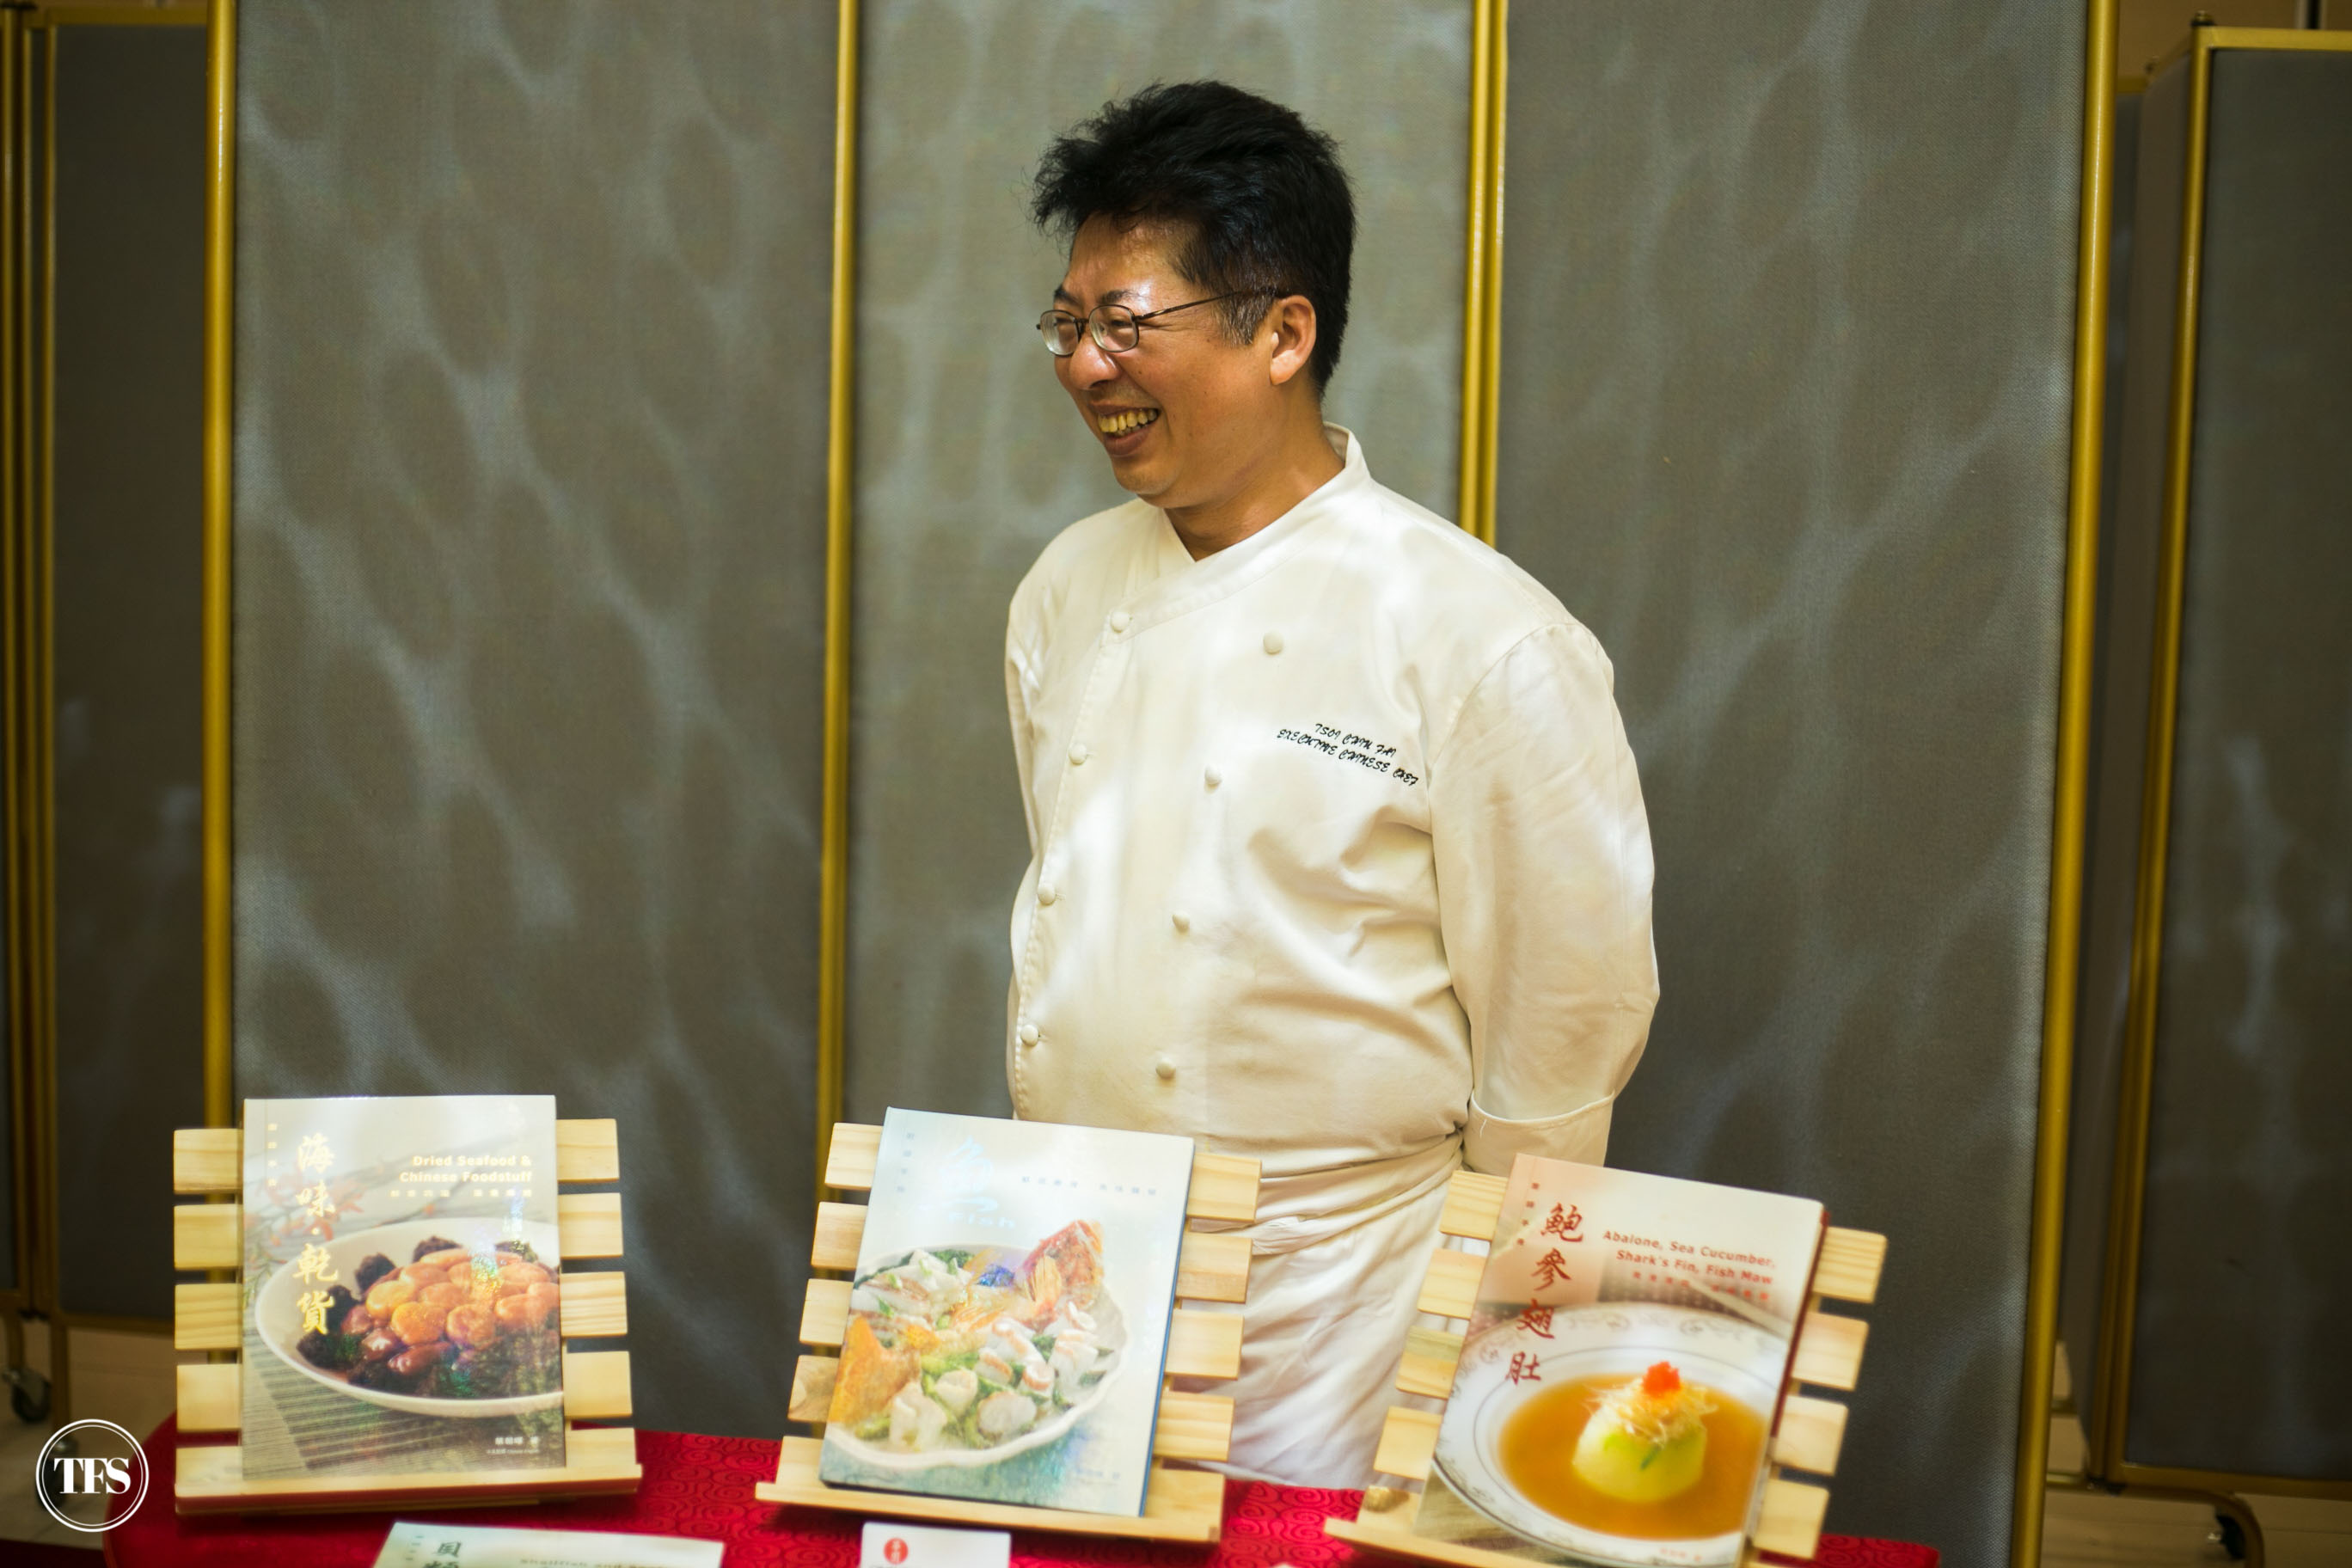 Master Chef Tsoi Chiu Fai